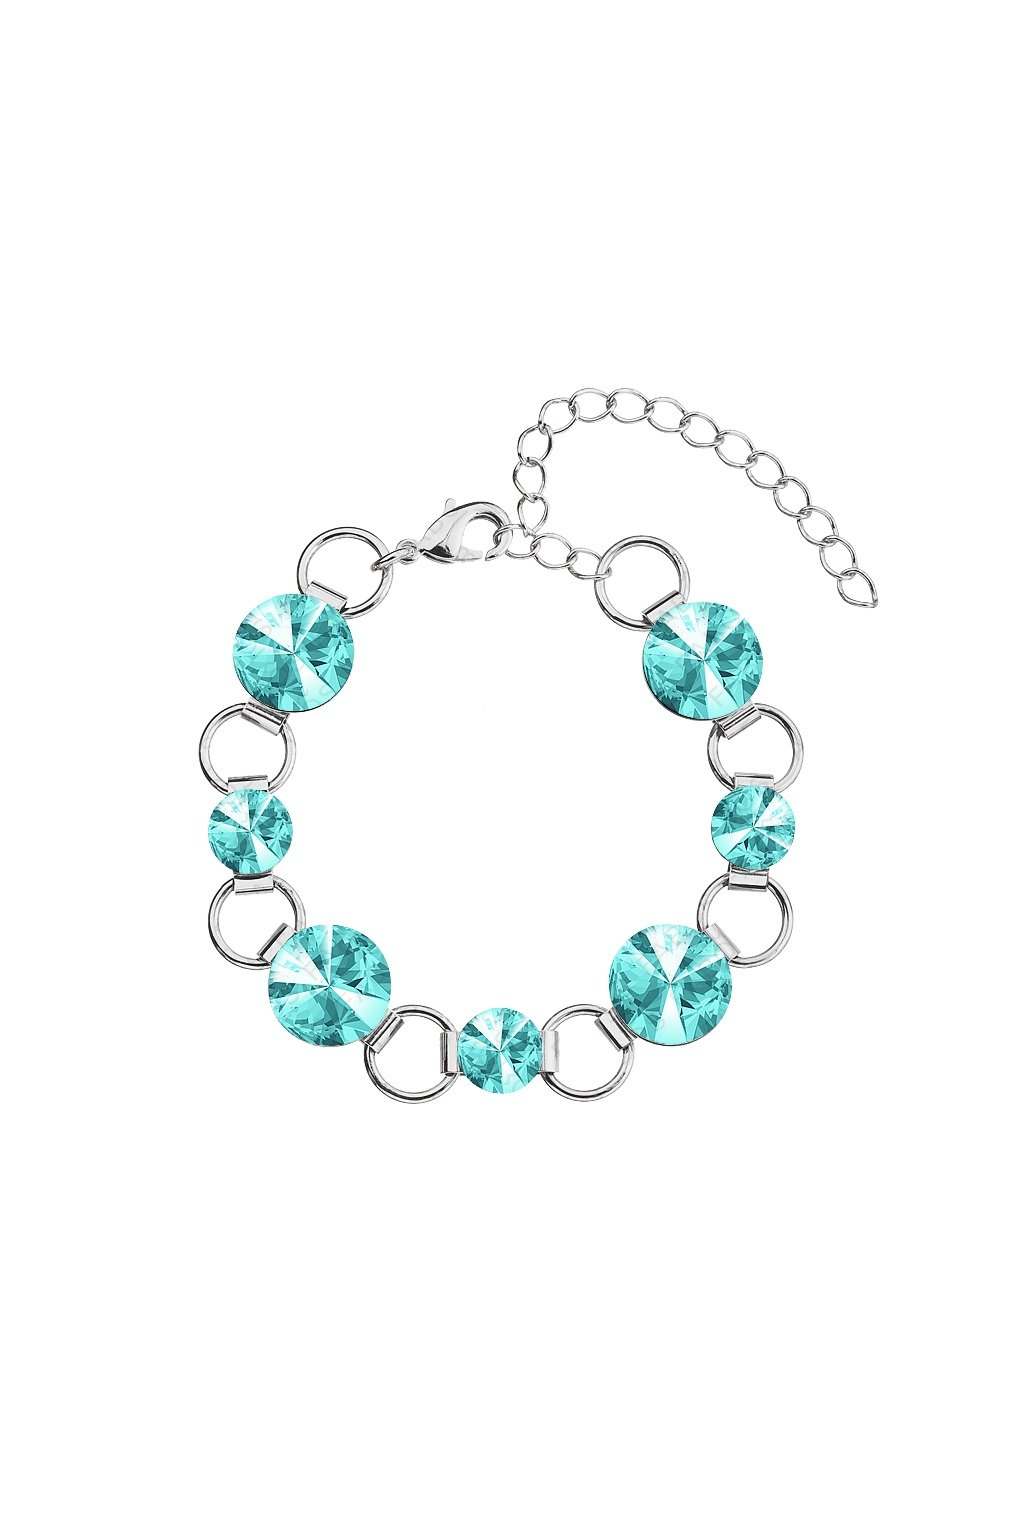 Náramek Rivoli 8-12 Turquoise  elements Swarovski